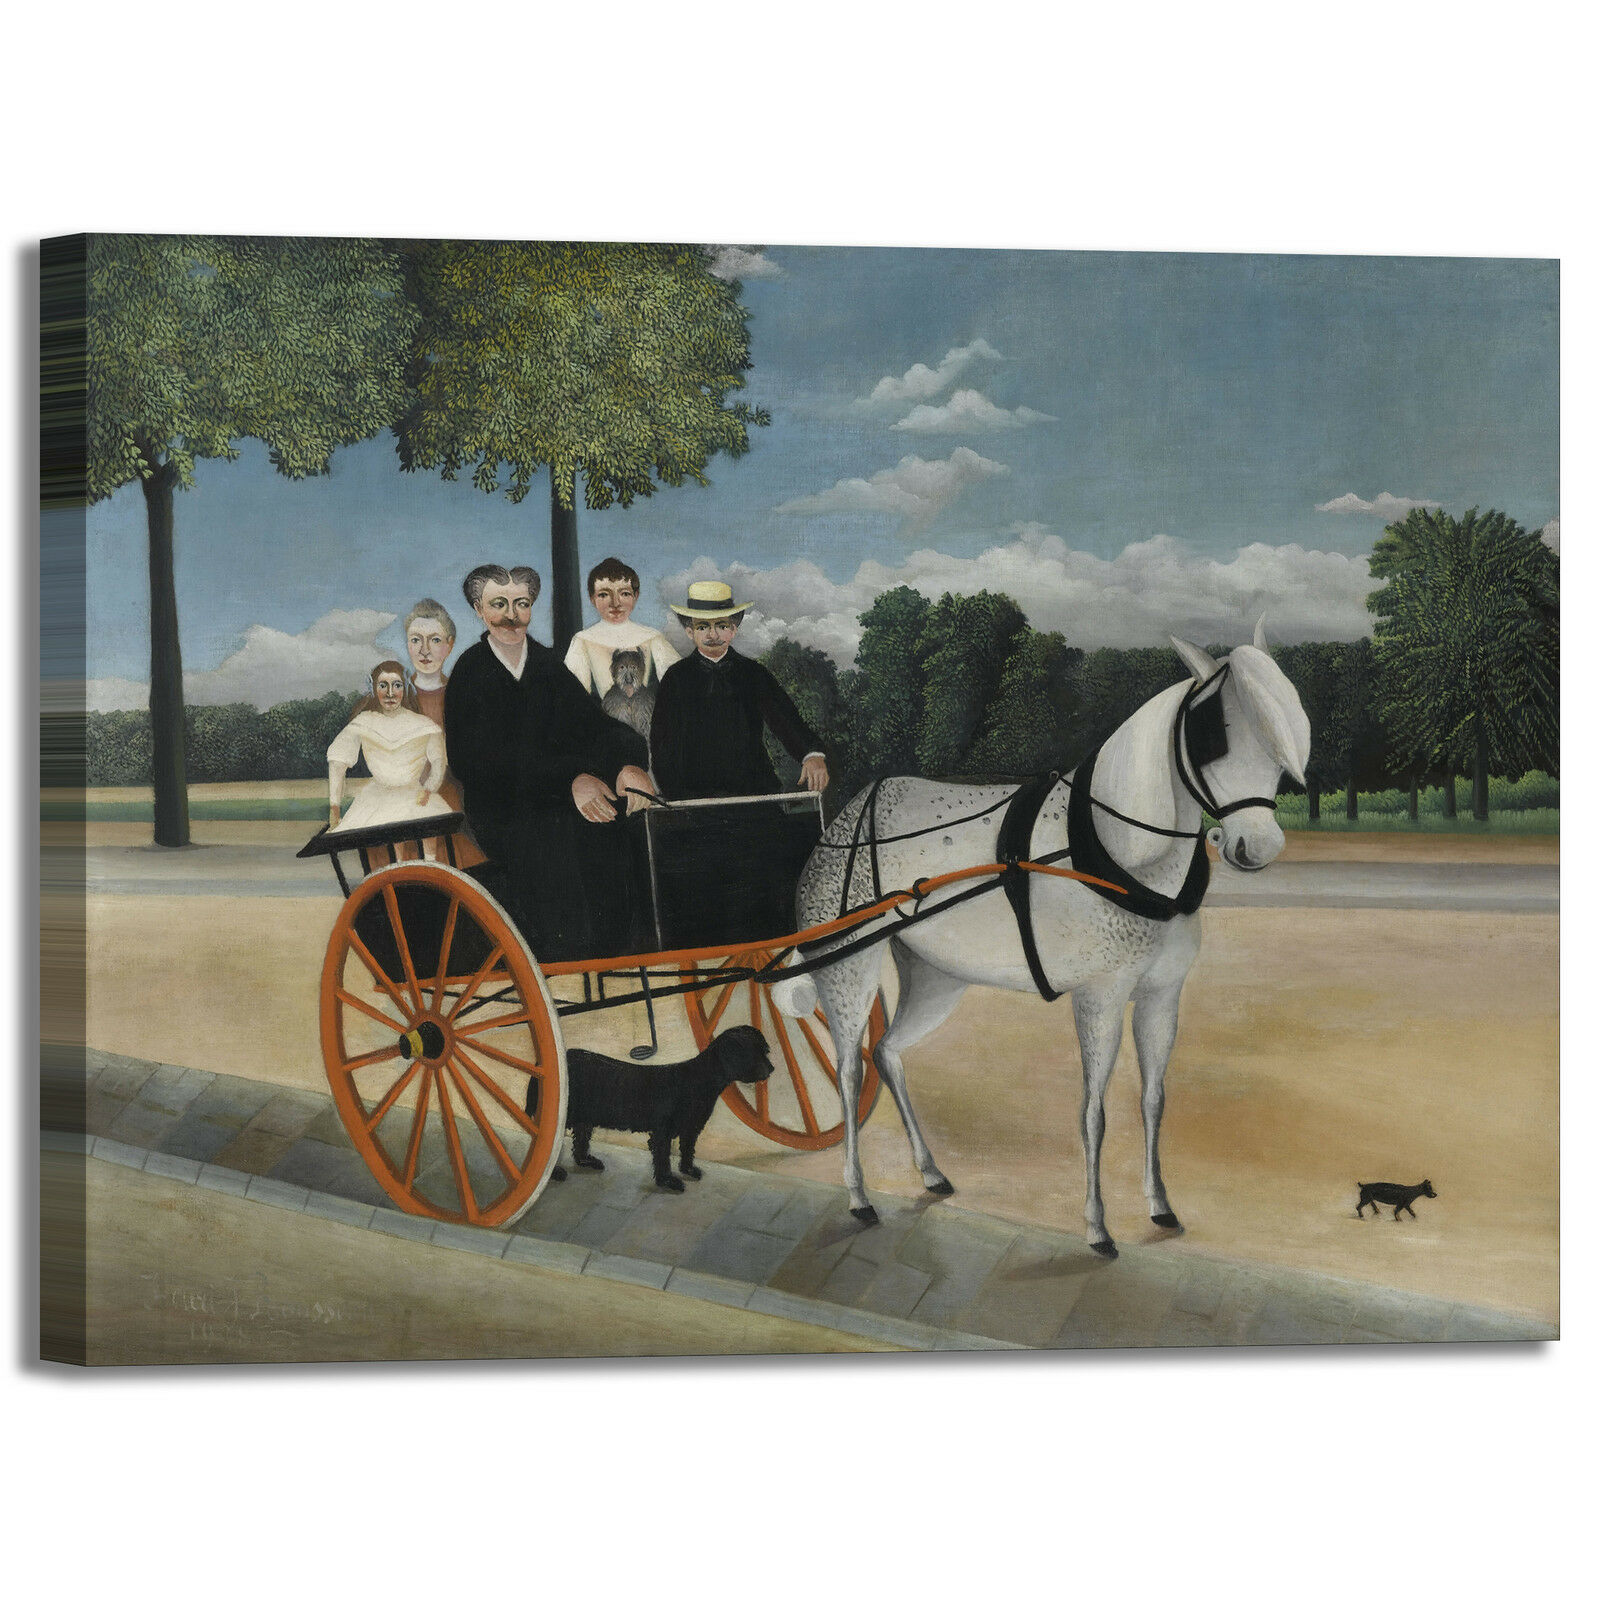 Rousseau calesse dipinto di Junier design quadro stampa tela dipinto calesse telaio arRouge o casa c6df90